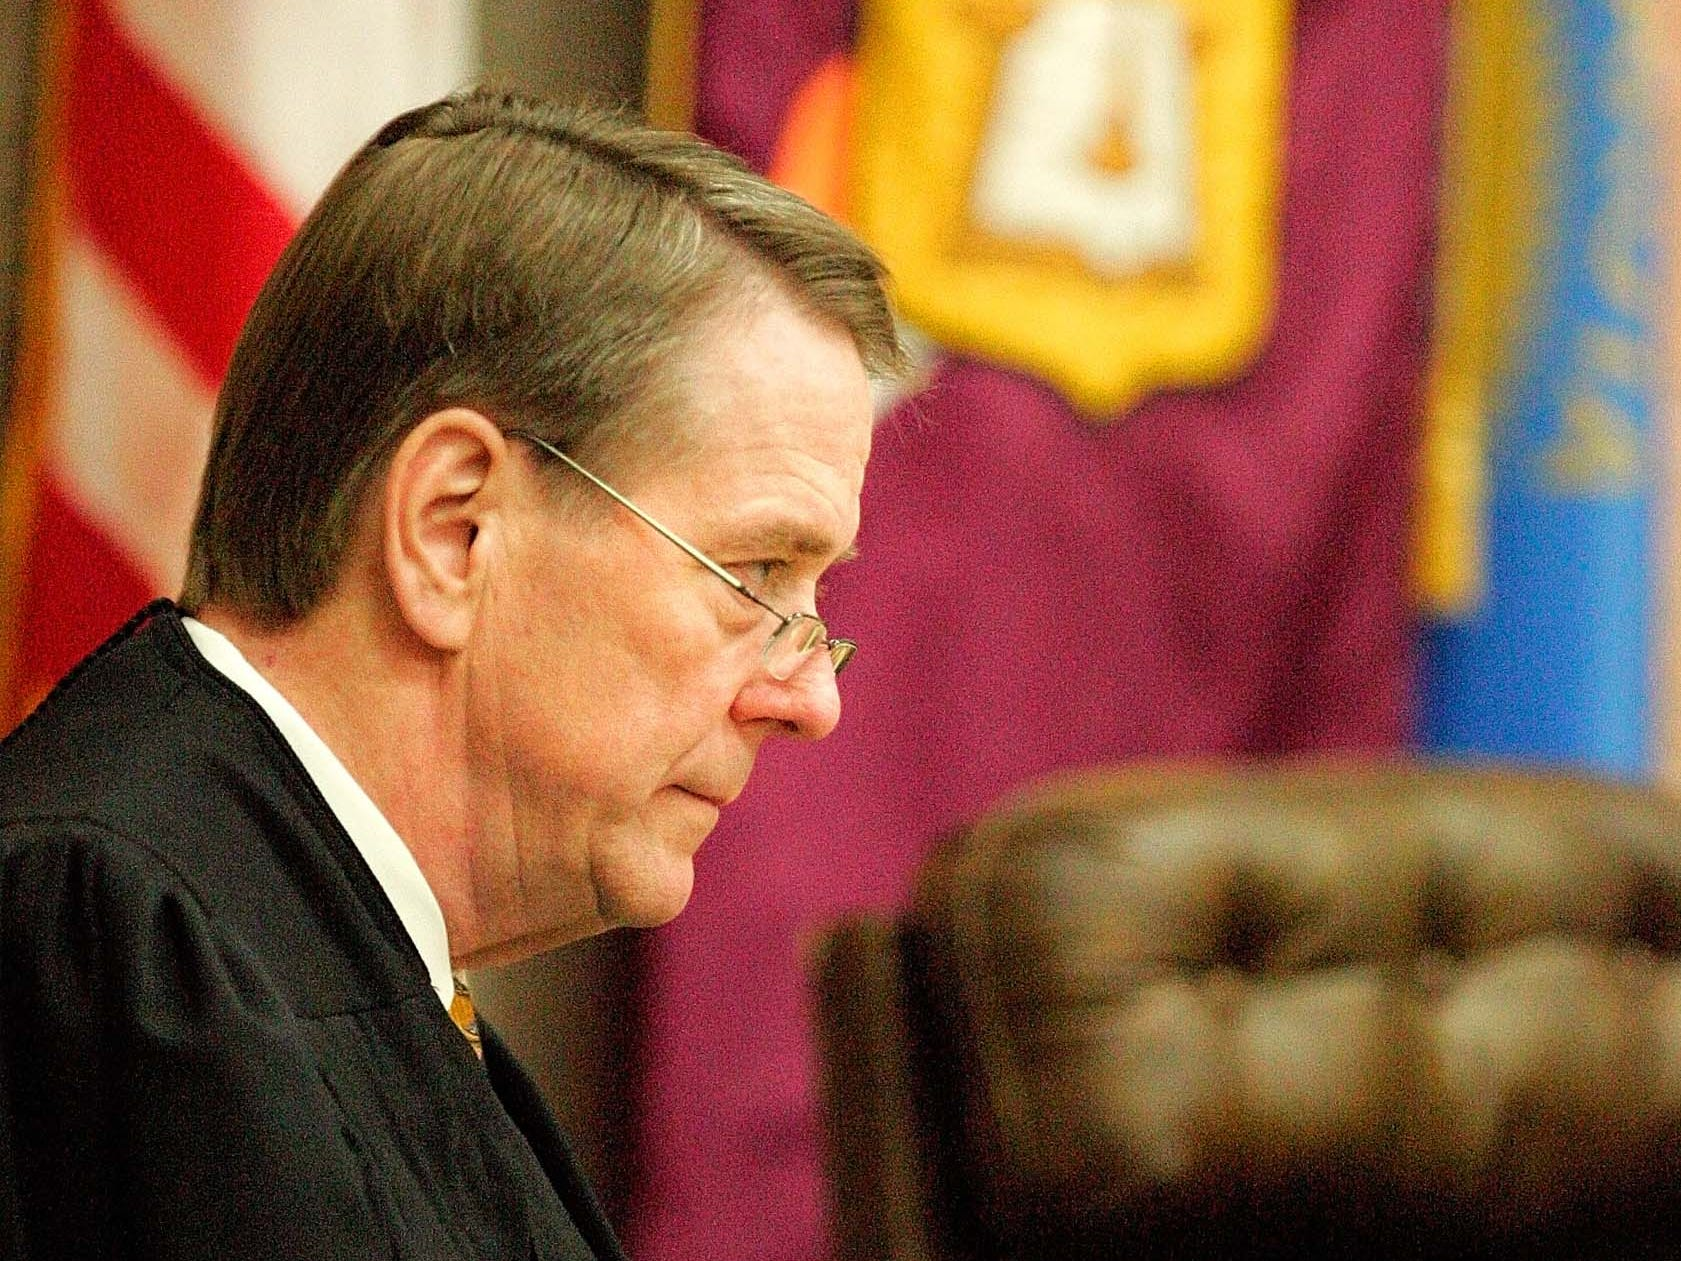 South Dakota Supreme Court Justice Steven L. Zinter hears the State v. Mulligan case in 2007.